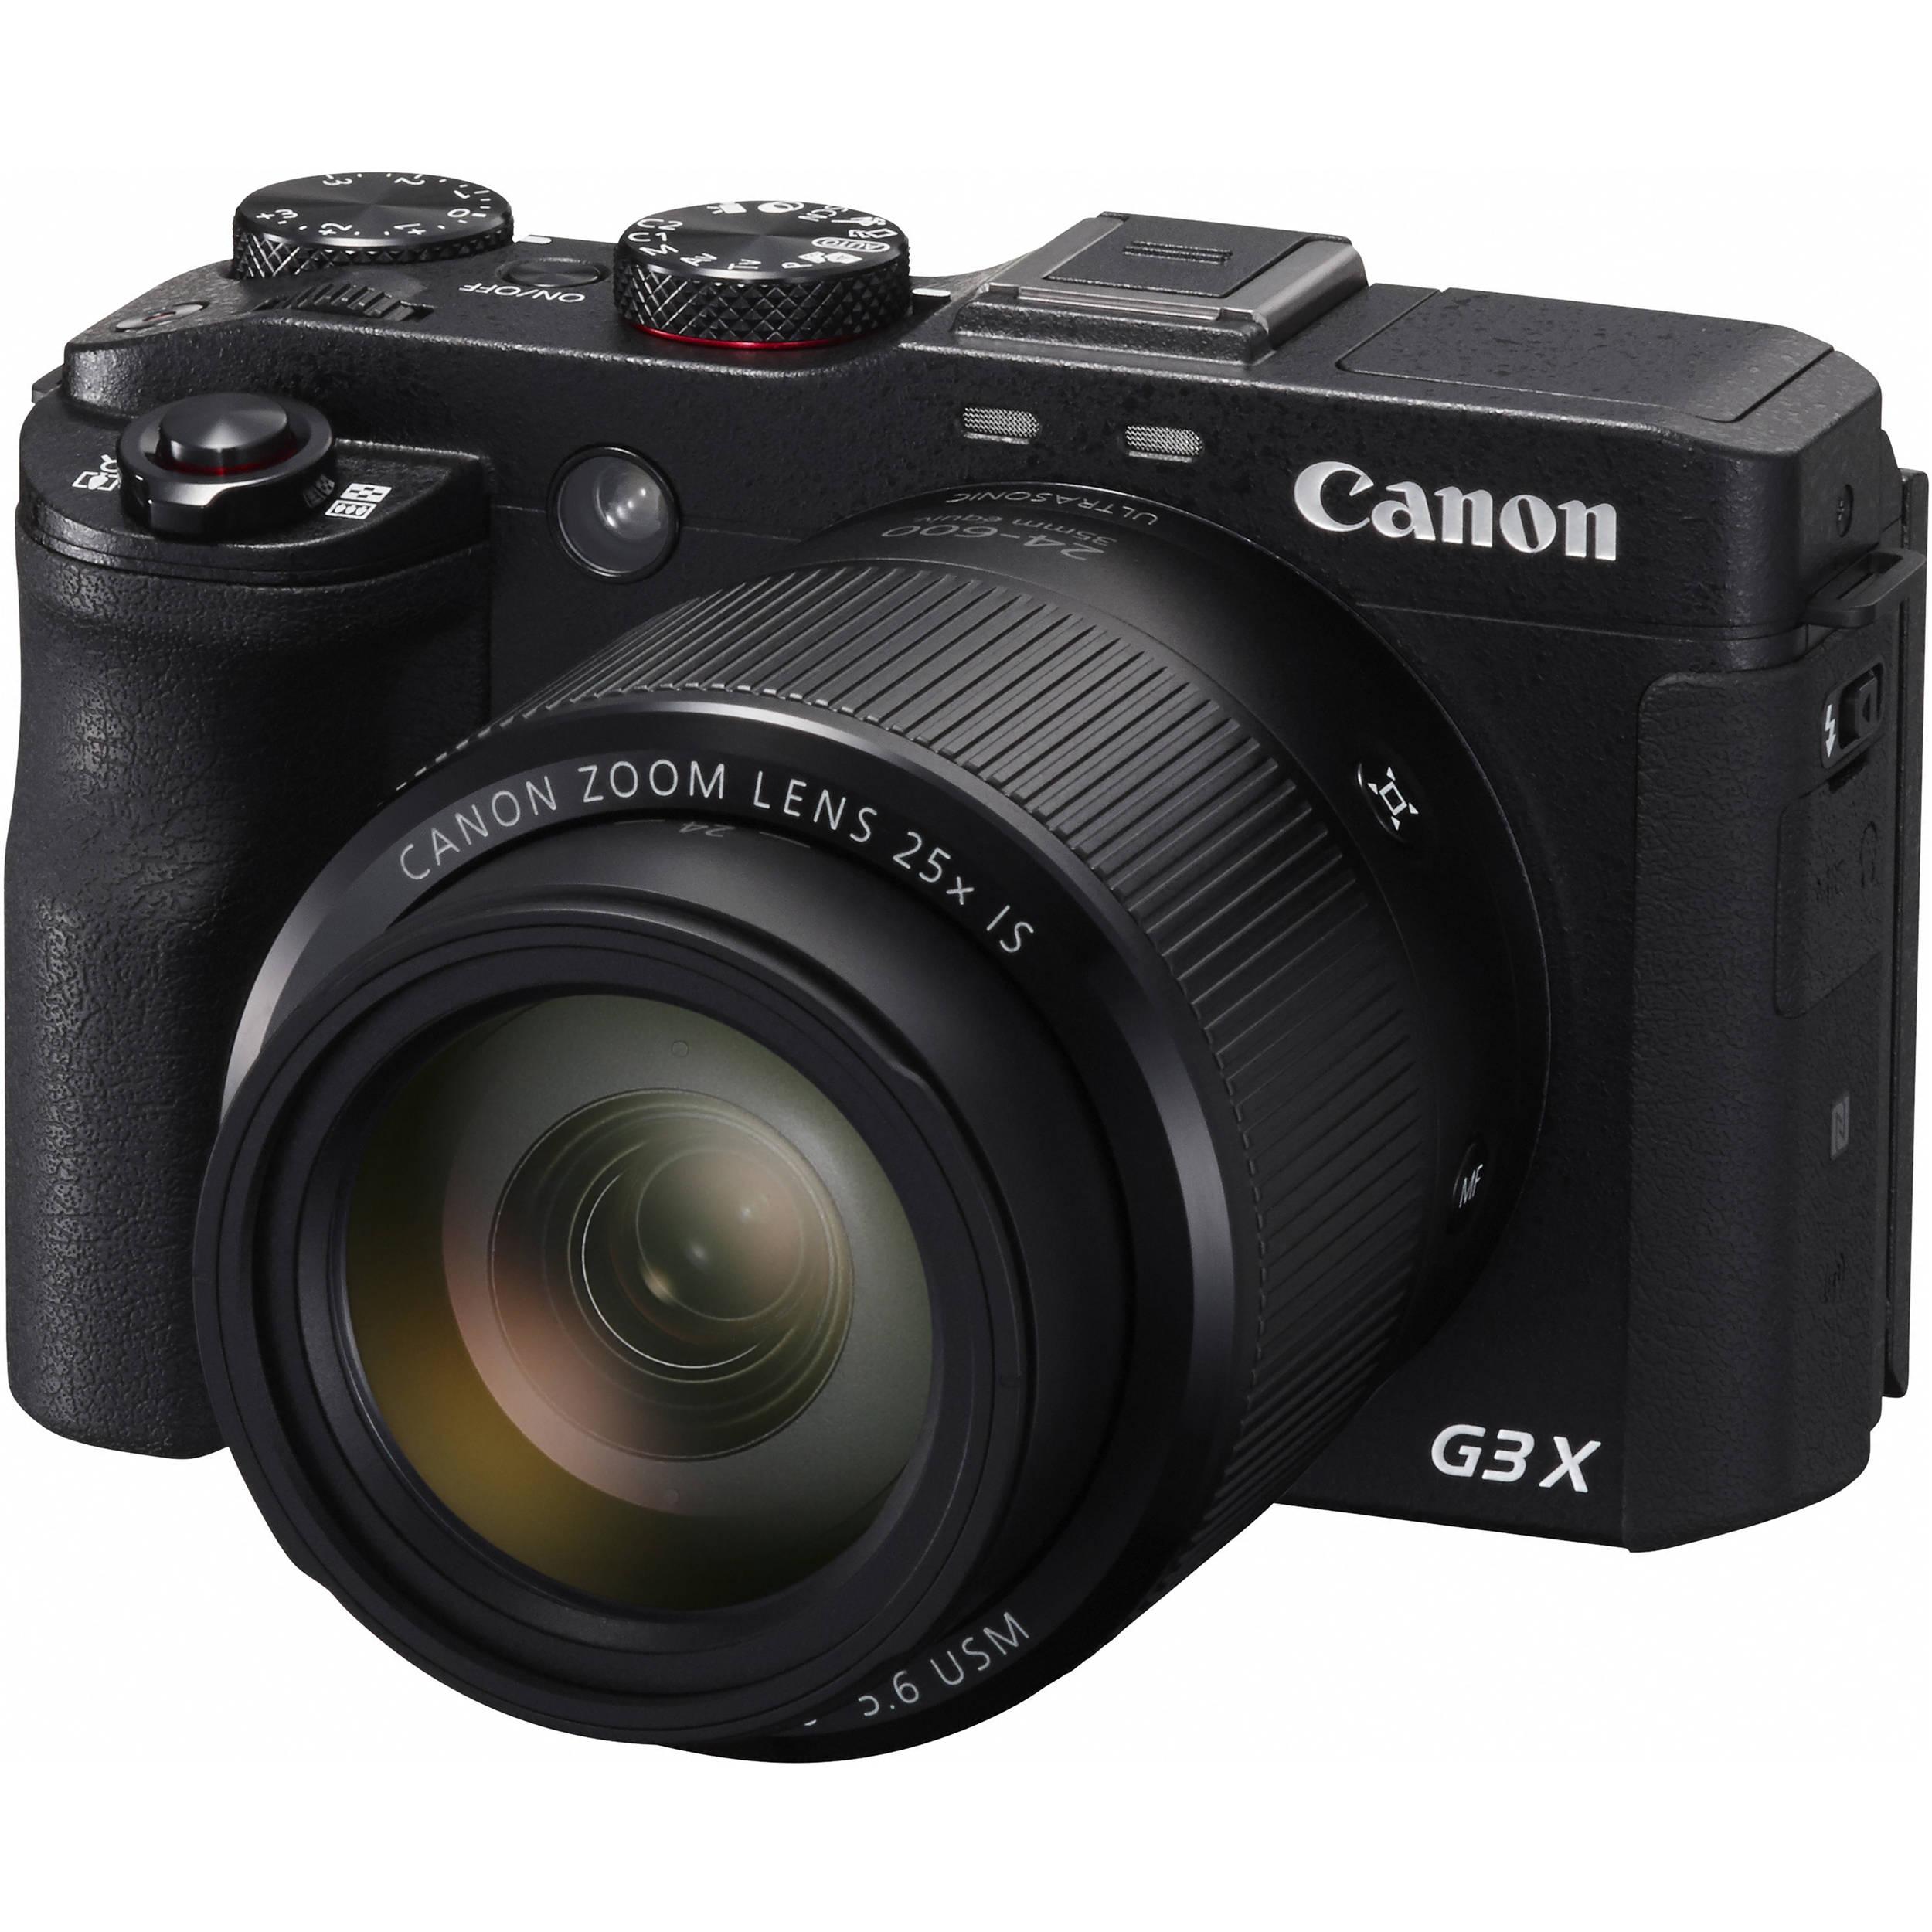 canon powershot g3 x digital camera 0106c001 b h photo video rh bhphotovideo com Canon PowerShot G1 canon powershot g3 user manual